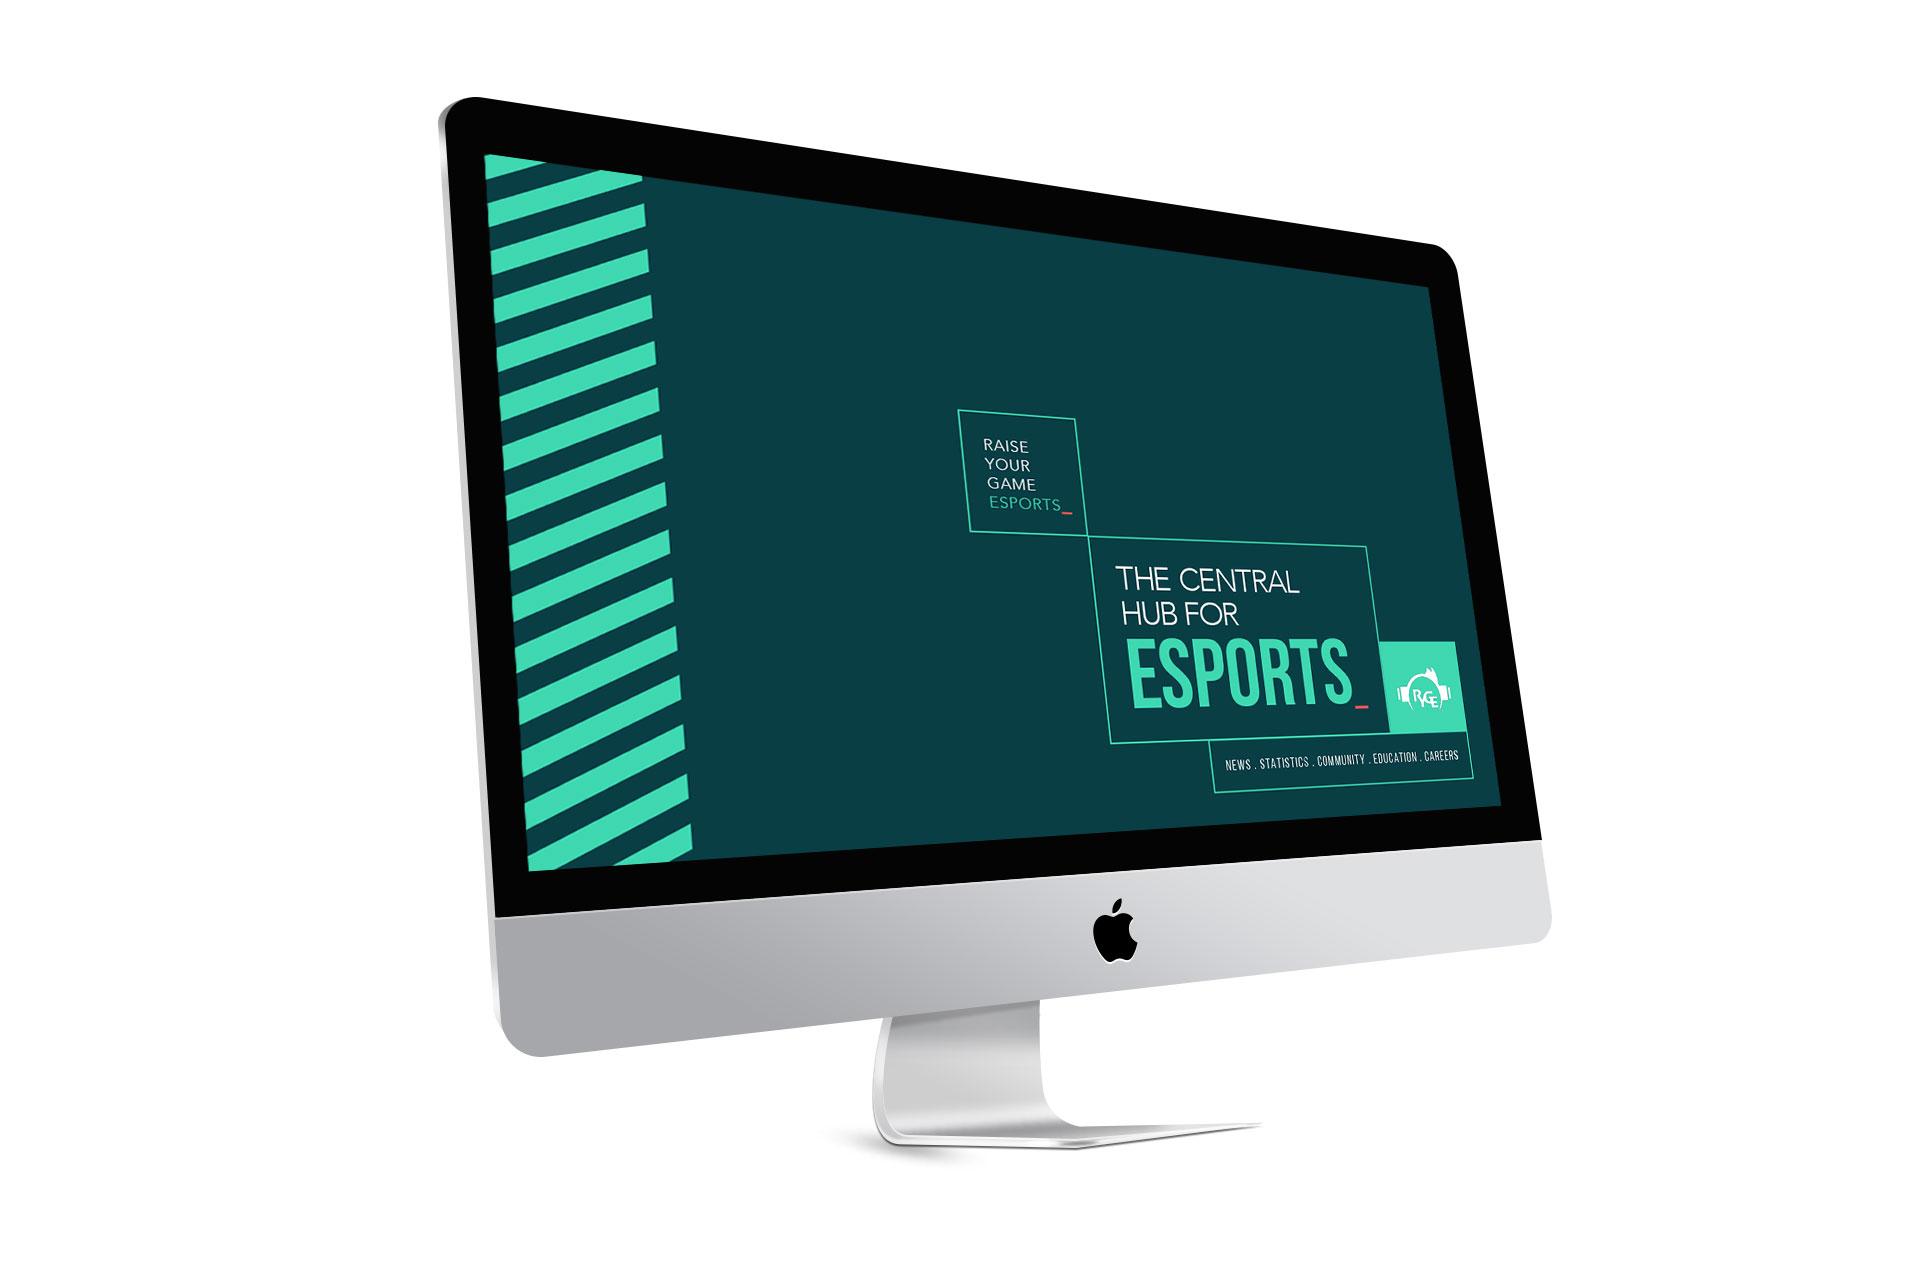 raise-your-game-esports-orfi-media-design-5